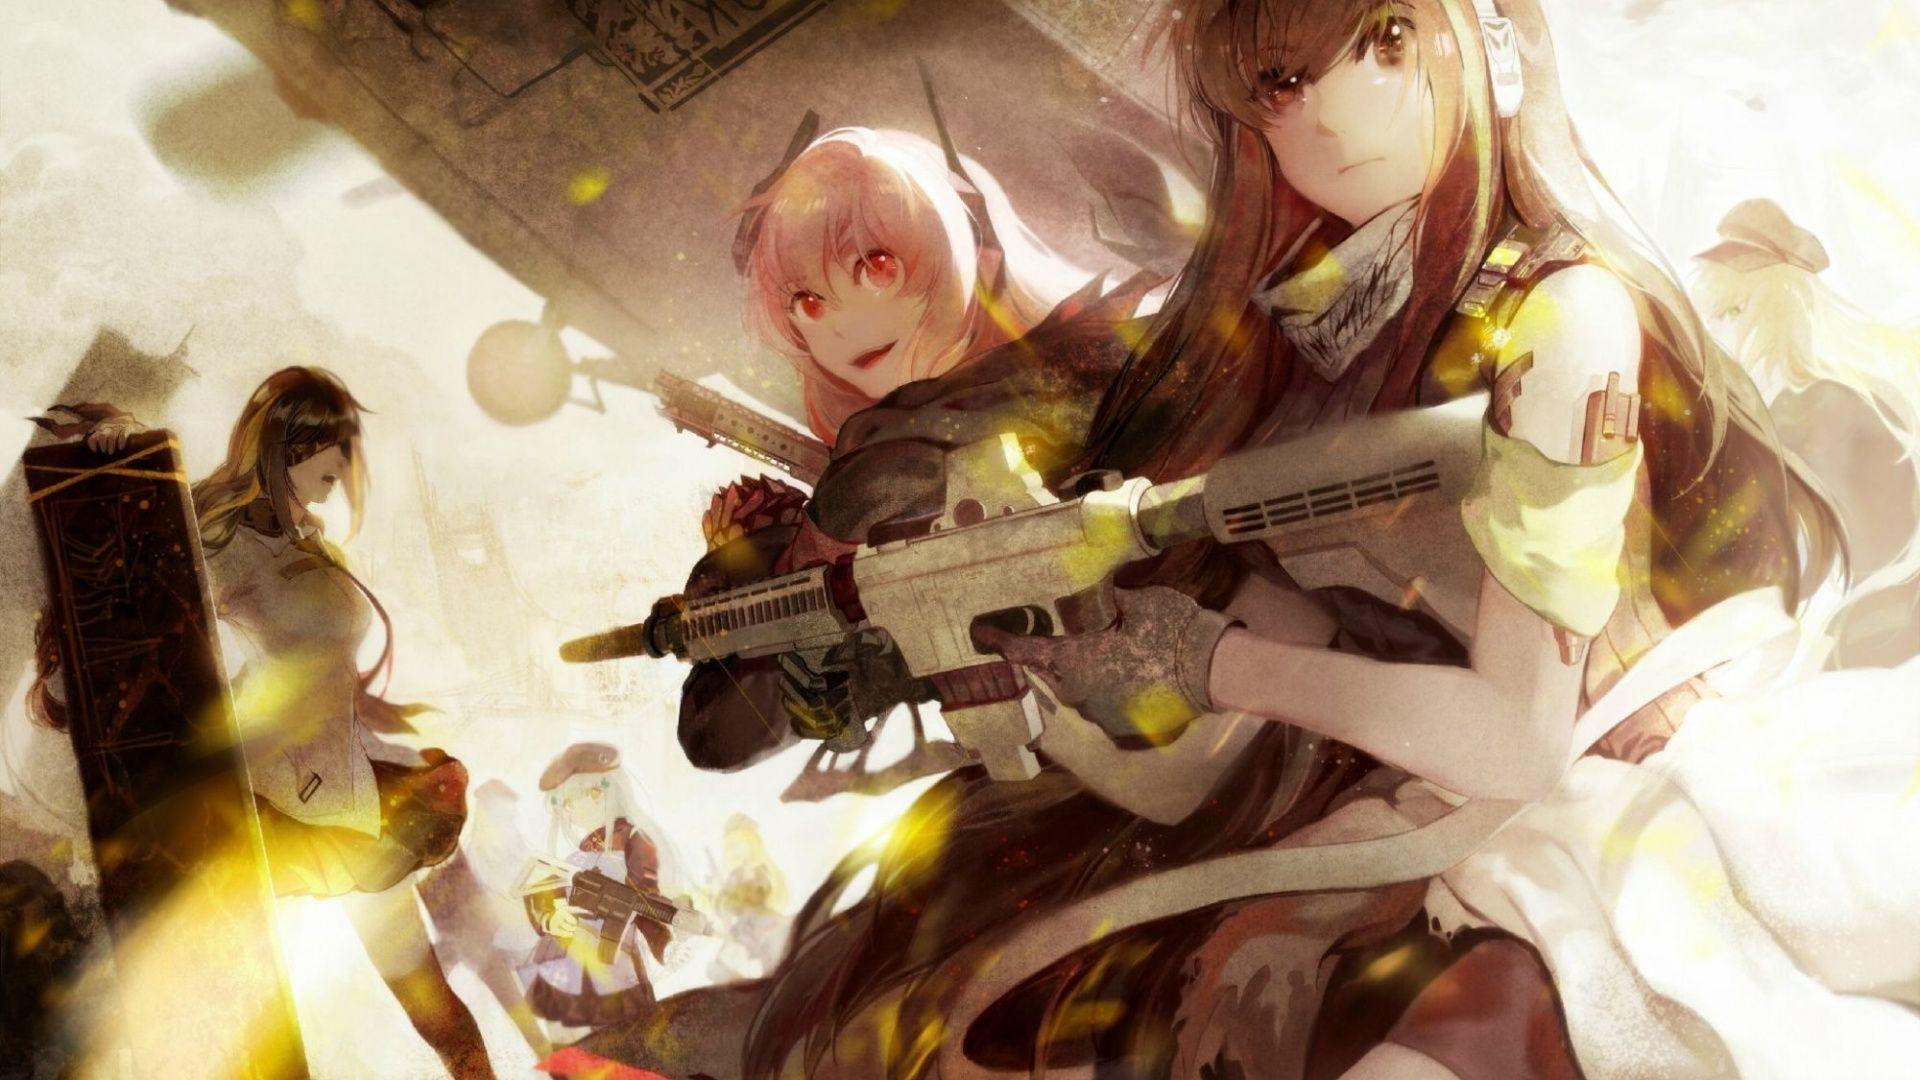 Pin On Soldier Anime Girls